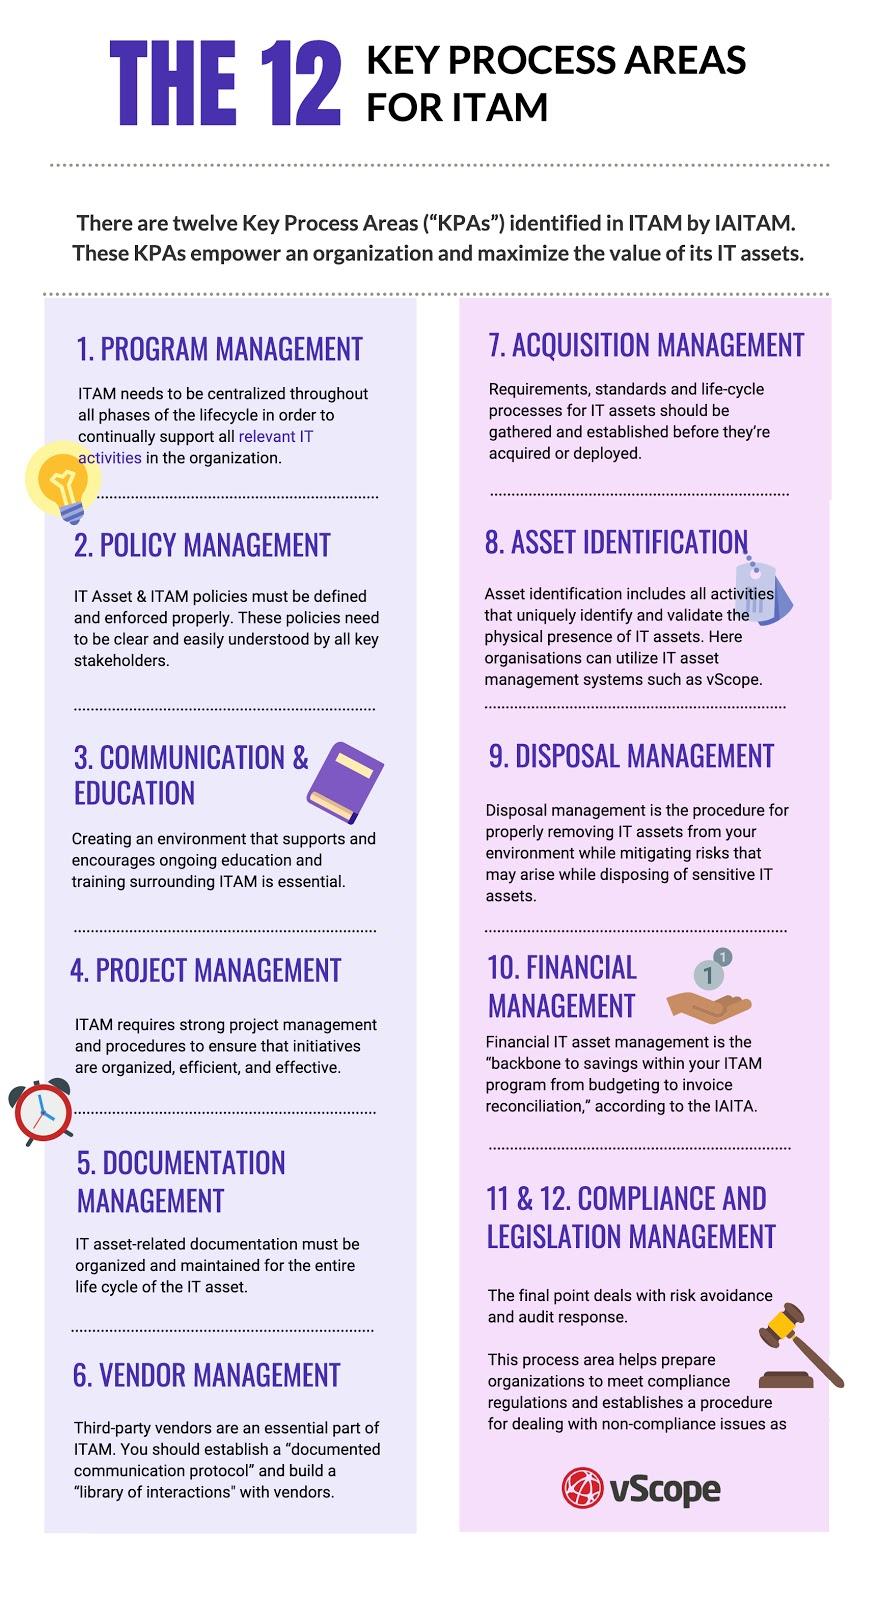 12 key process areas of ITAM